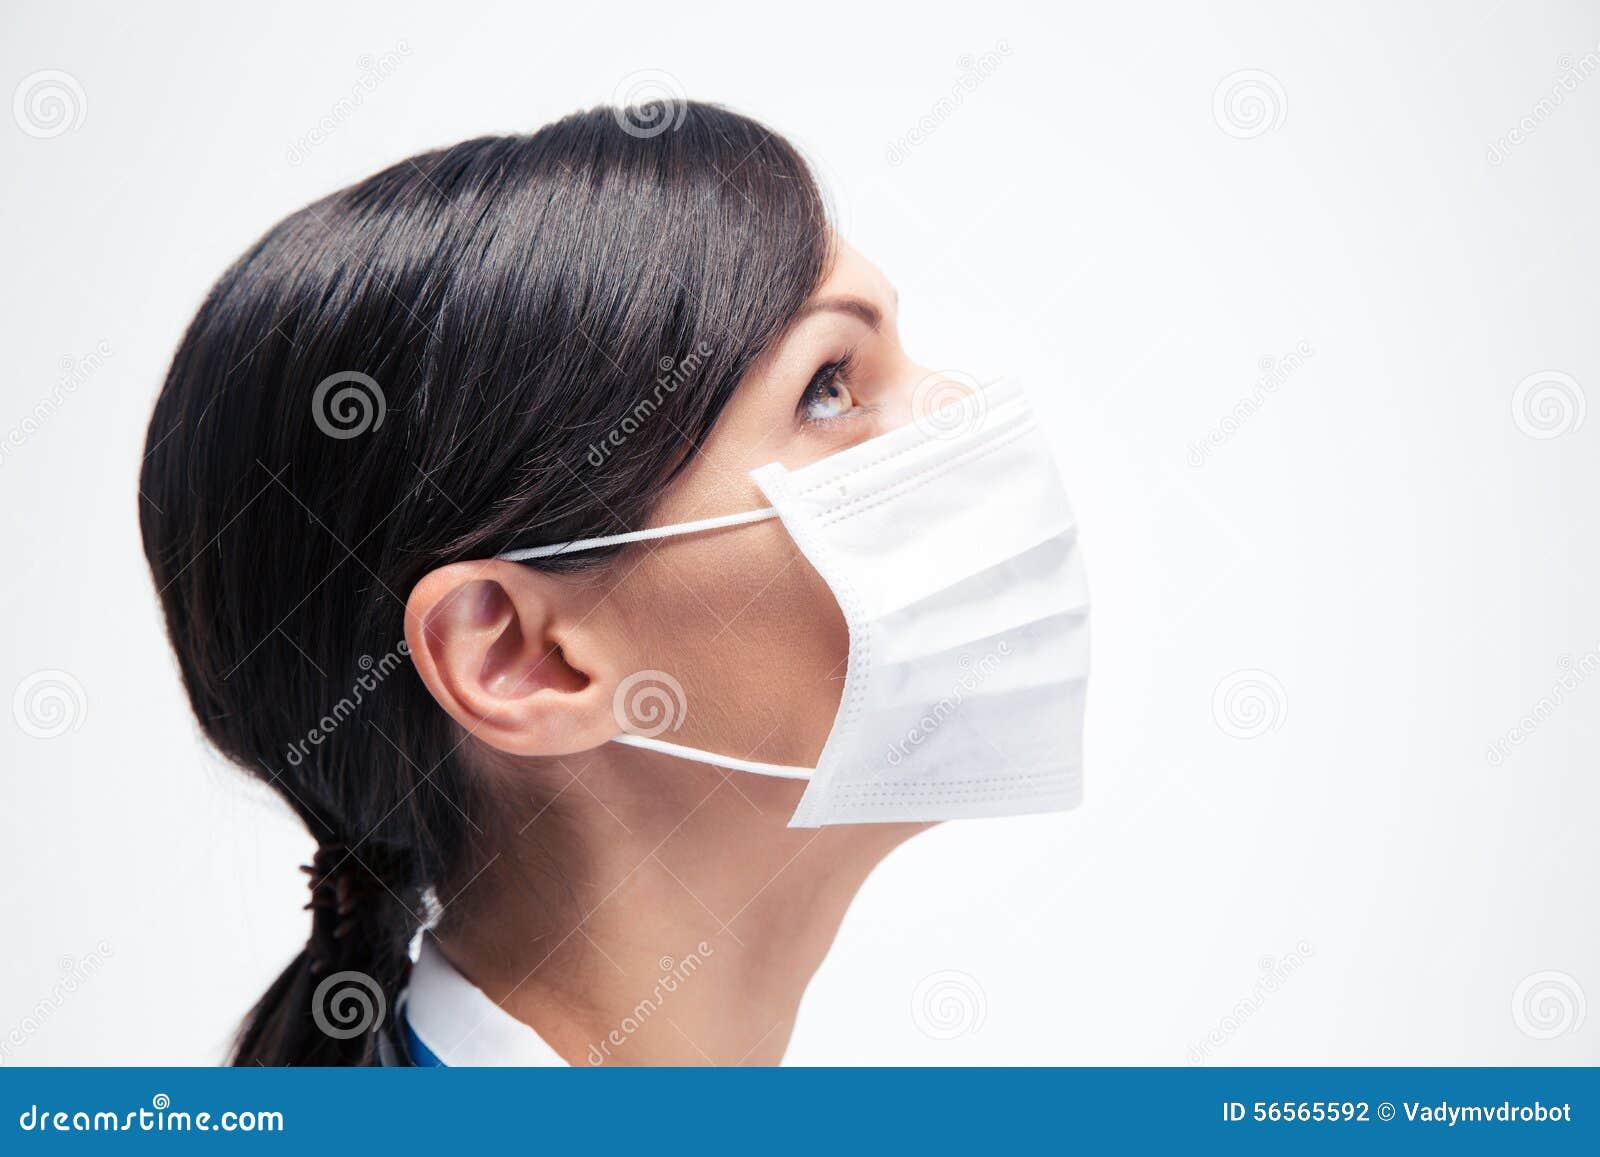 Download Θηλυκός ιατρός στη μάσκα που ανατρέχει Στοκ Εικόνες - εικόνα από σύγχρονος, ειδικός: 56565592